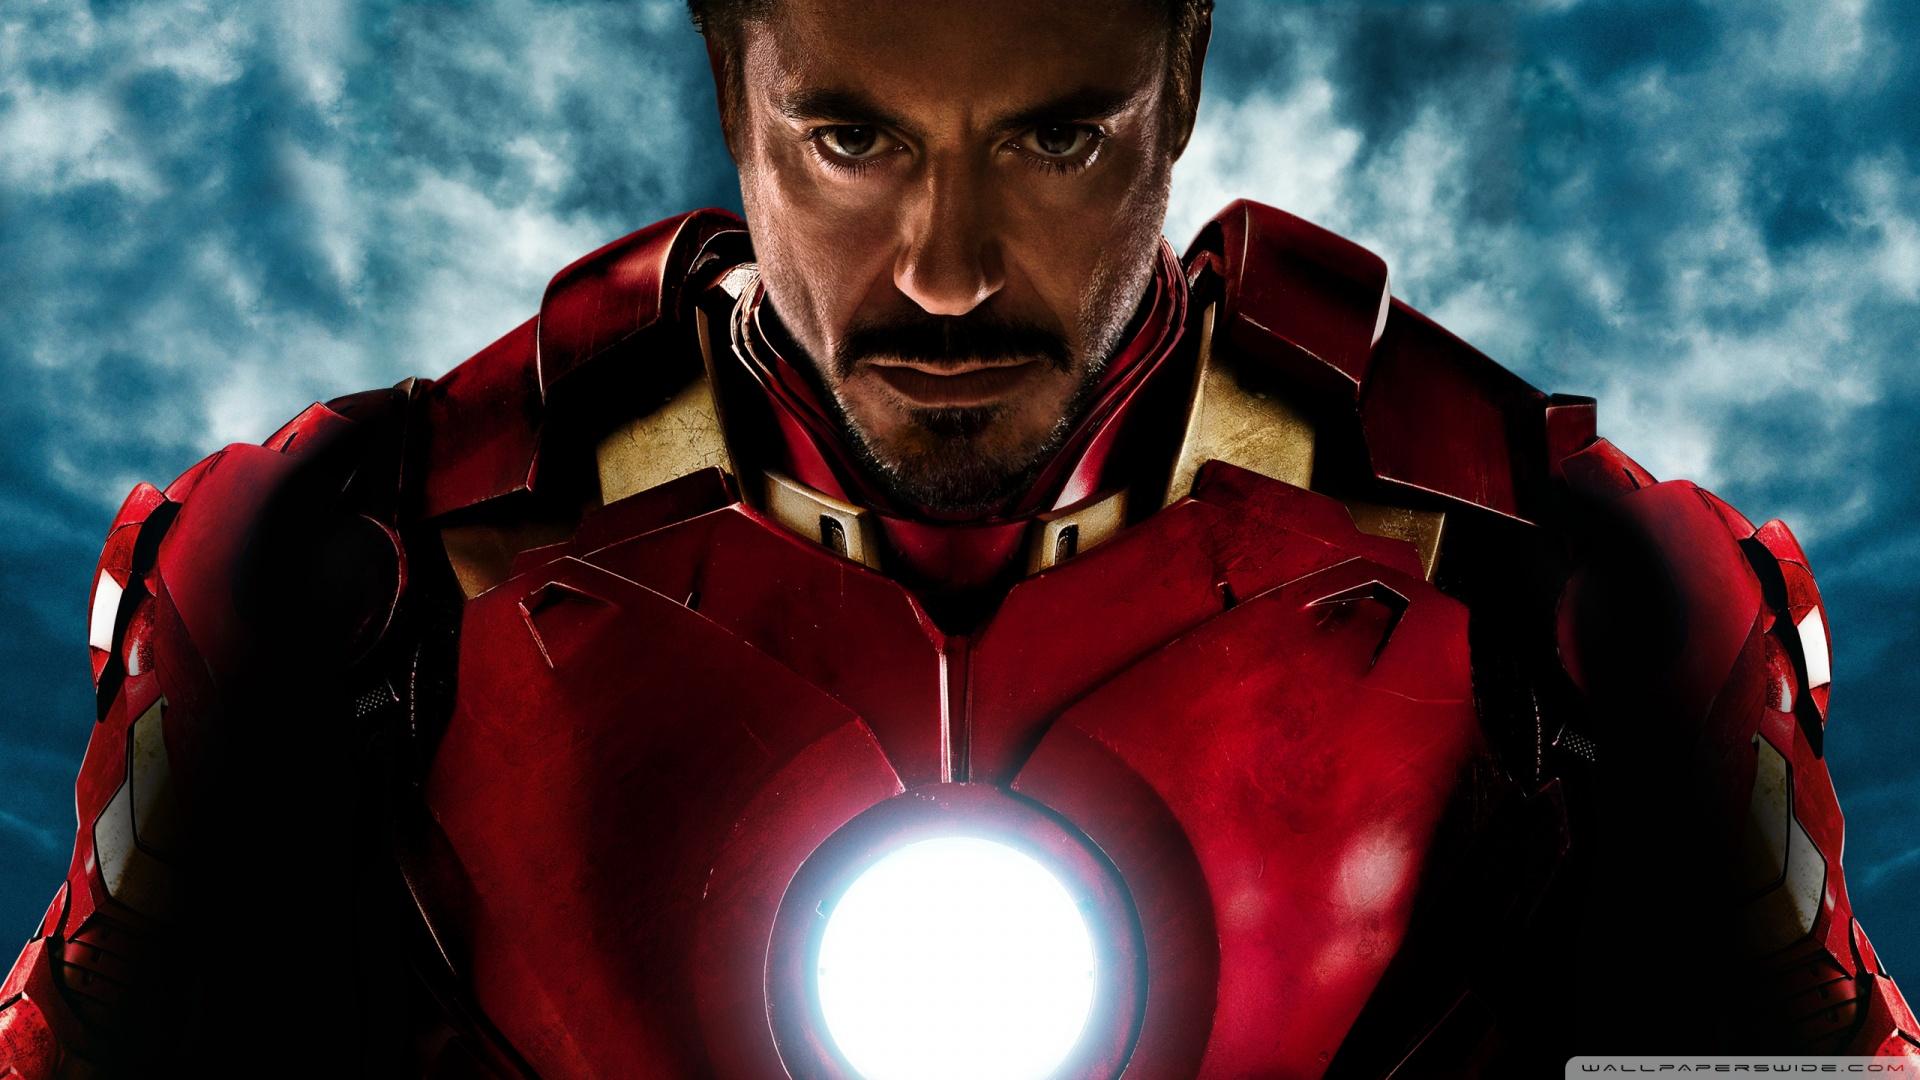 Tablet Wallpaper Hd Tony Stark Iron Man 2 Ultra Hd Desktop Background